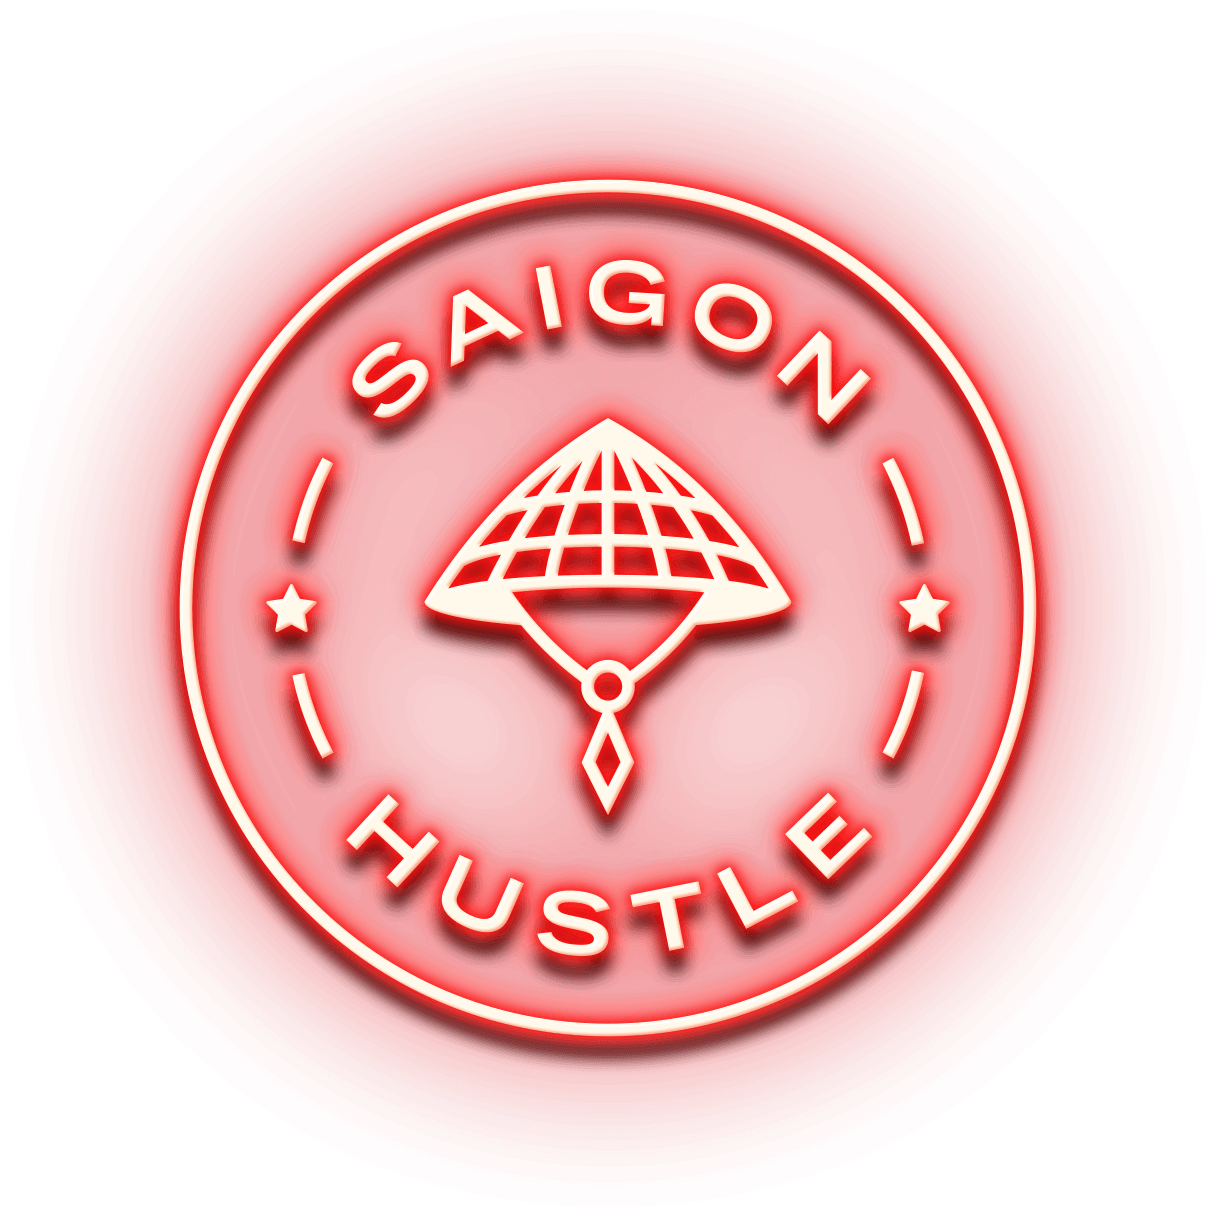 saigon hustle neon logo